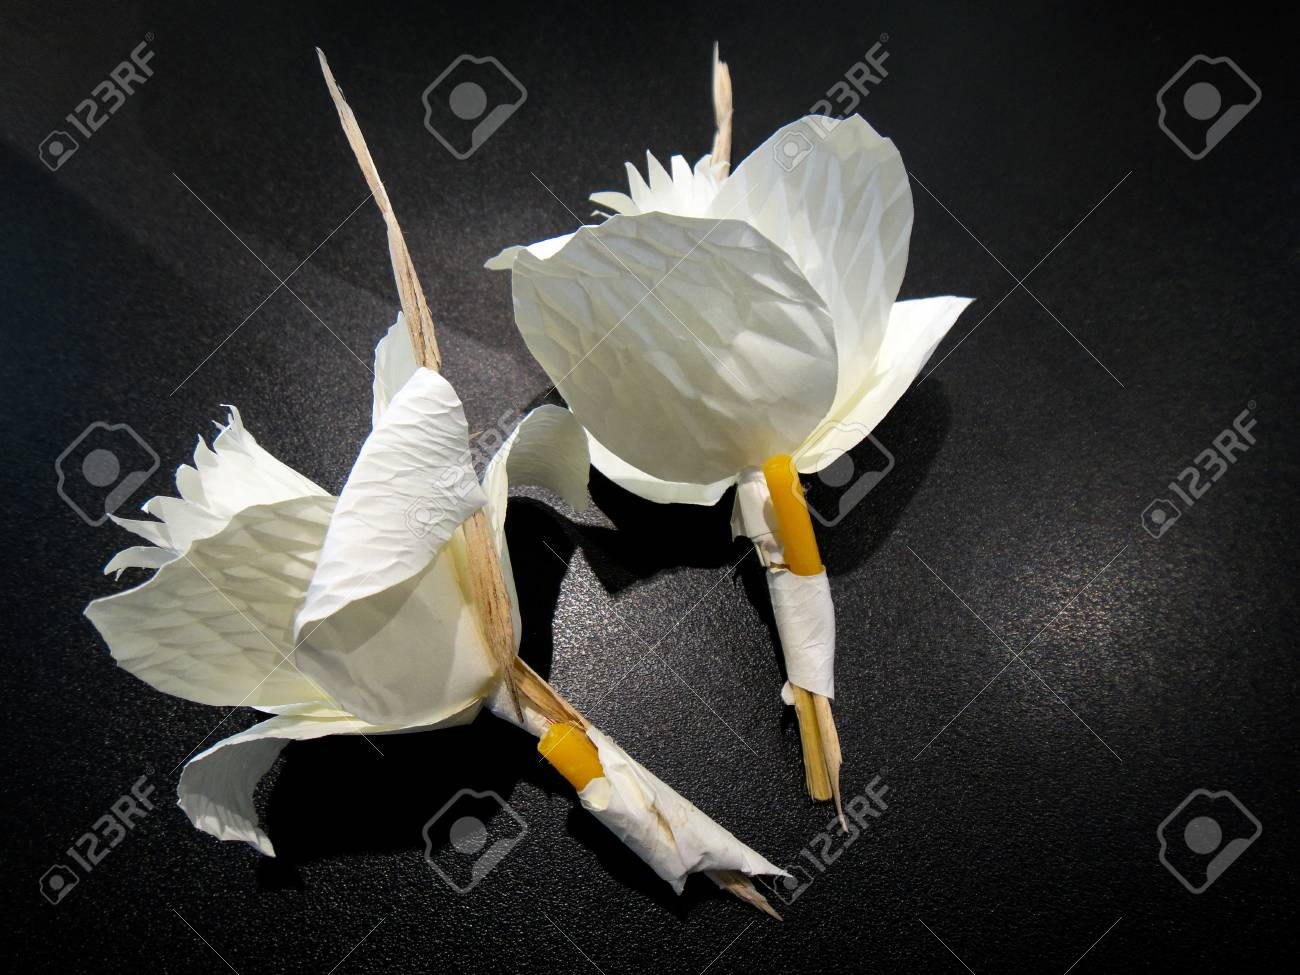 Thai funeral paper flowerkind of wood flower to be placed on stock photo thai funeral paper flowerkind of wood flower to be placed on the site of cremation izmirmasajfo Images